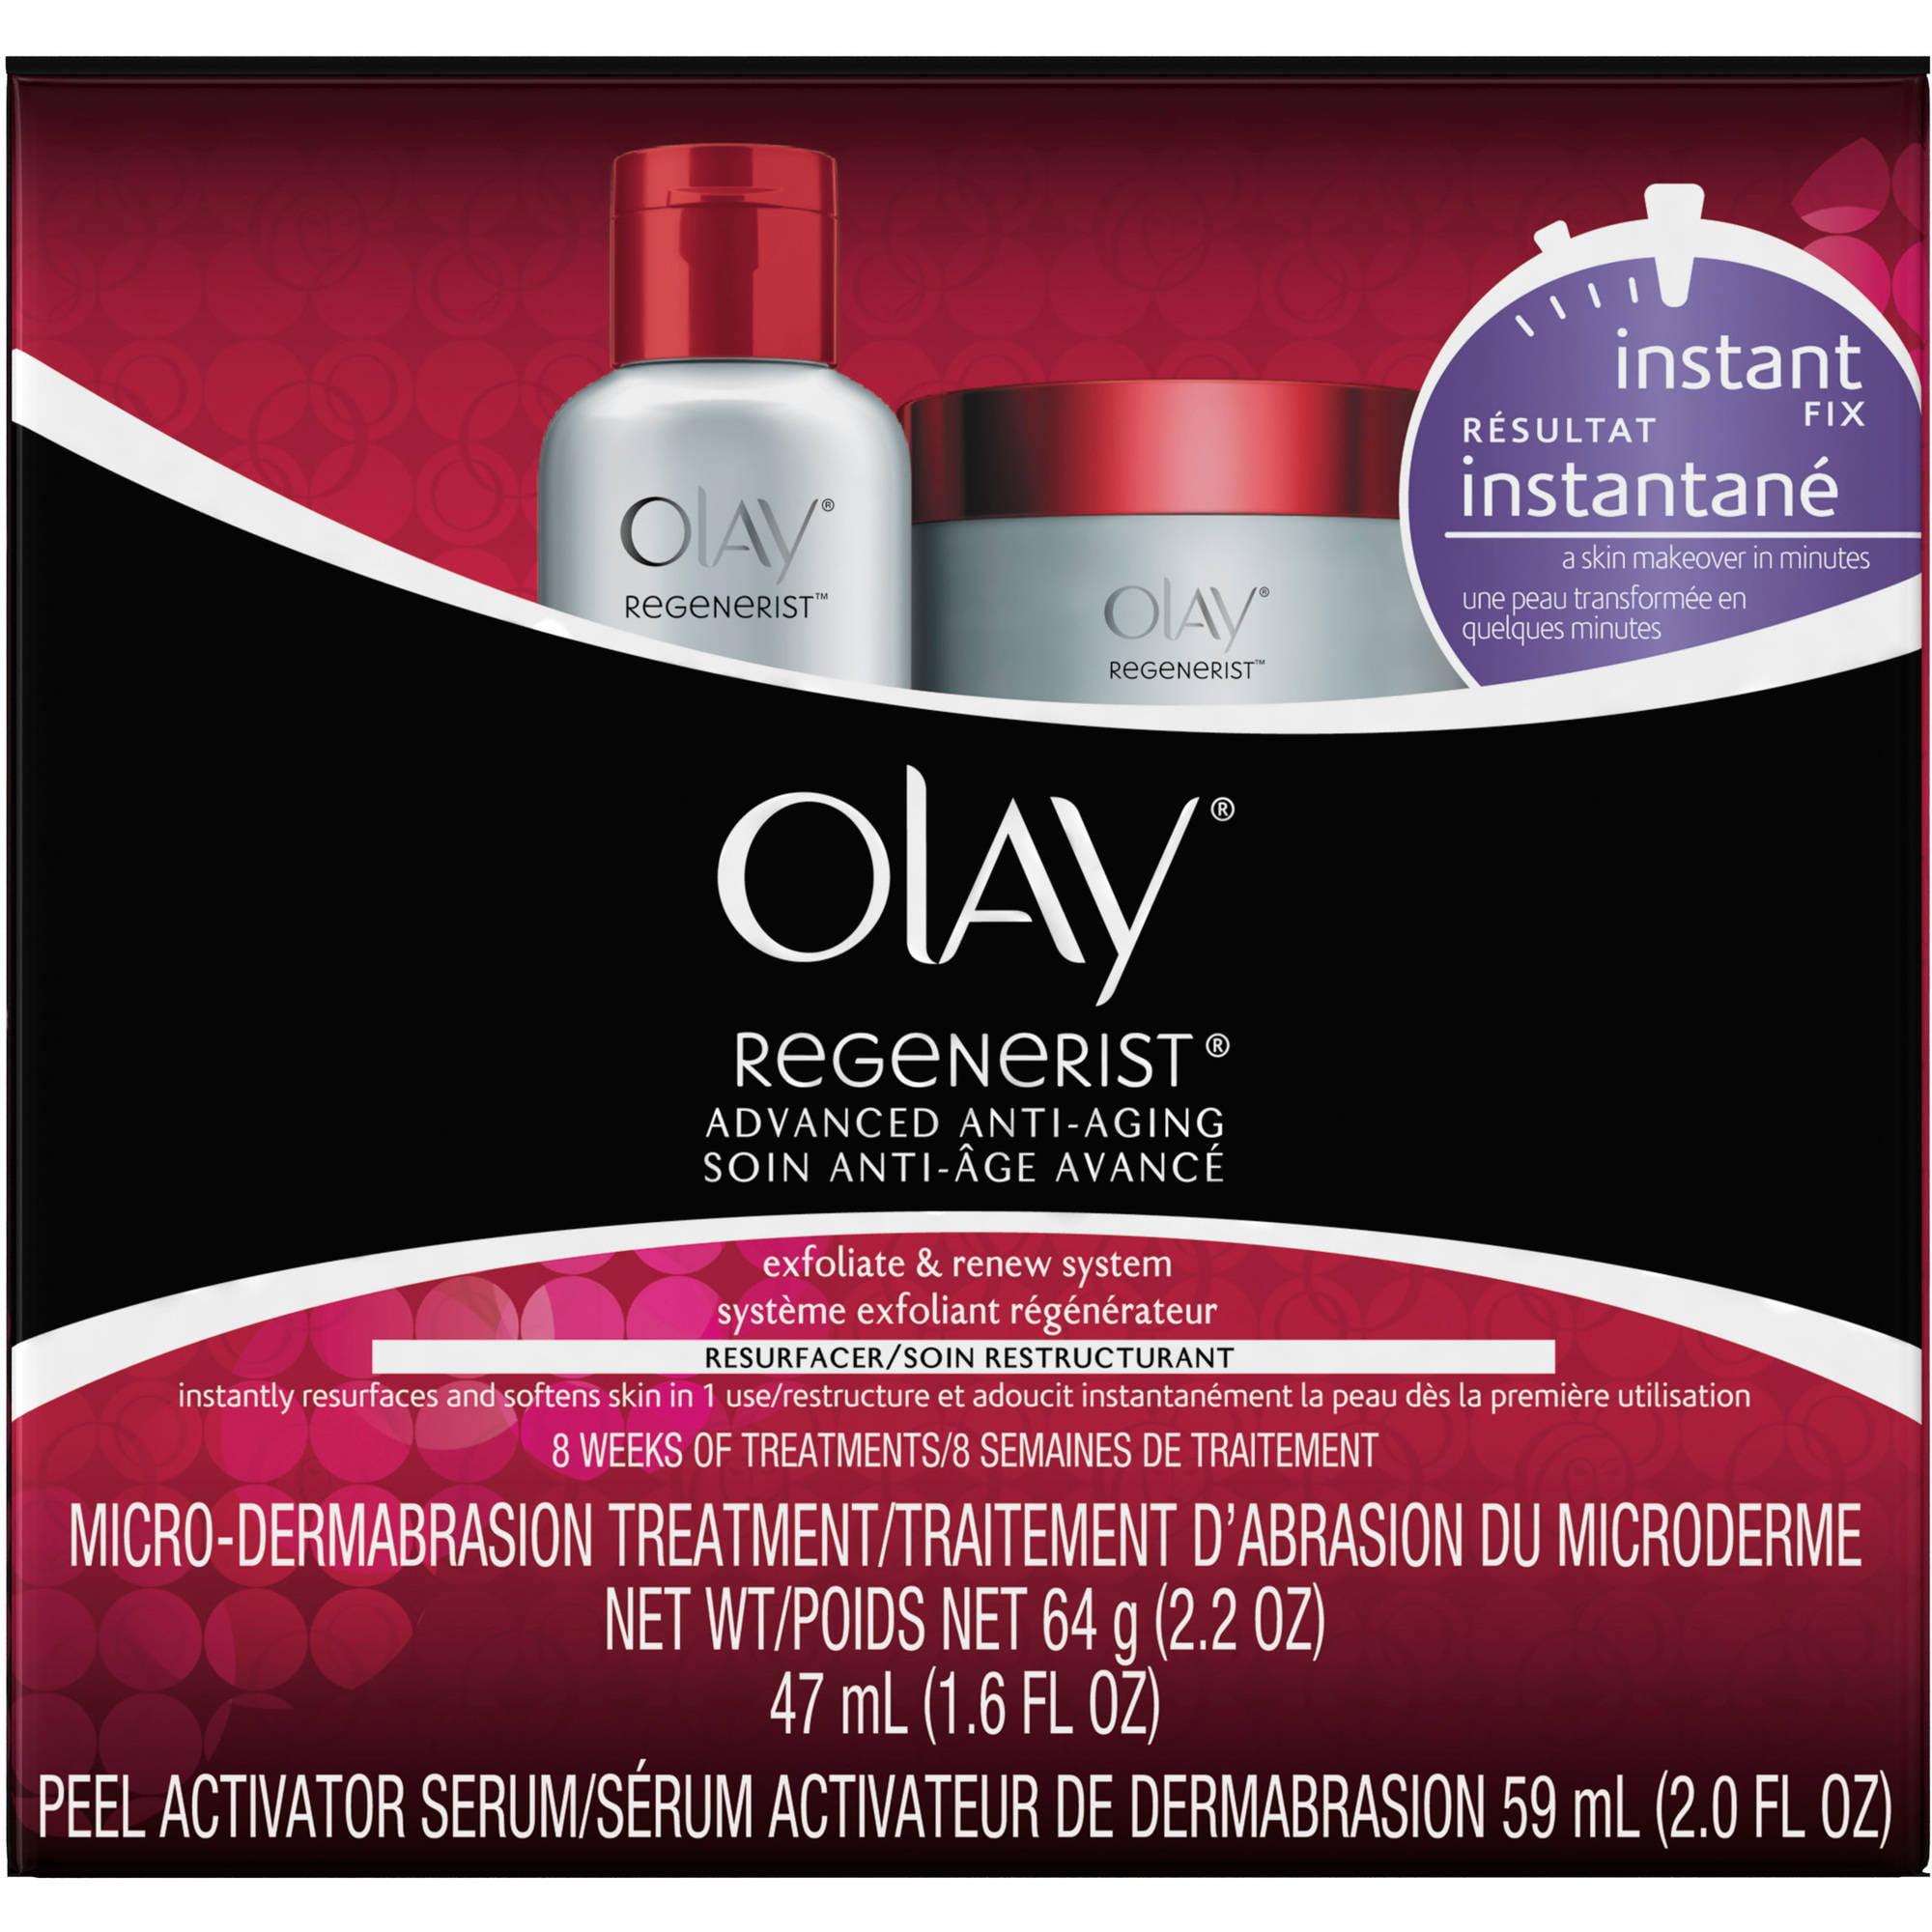 Olay Regenerist Microdermabrasion & Peel System Microdermabrasion Facial Treatment 1 Kit